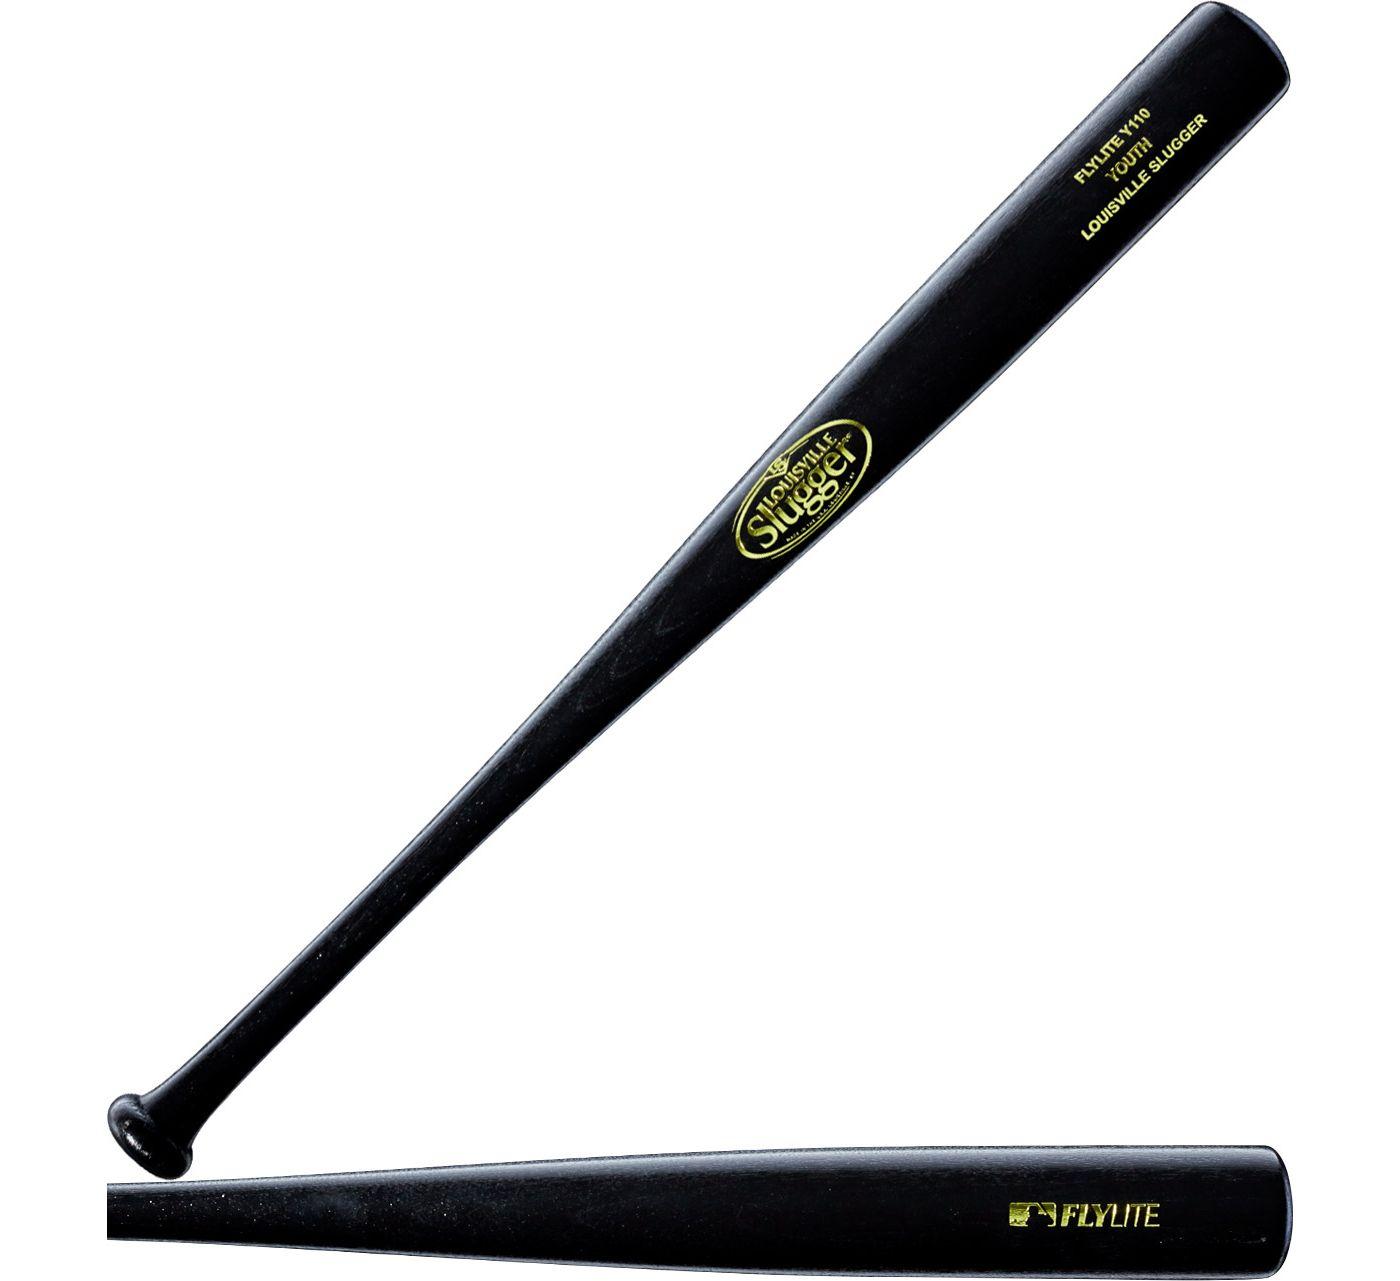 Louisville Slugger Youth Flylite Y110 Maple Bat